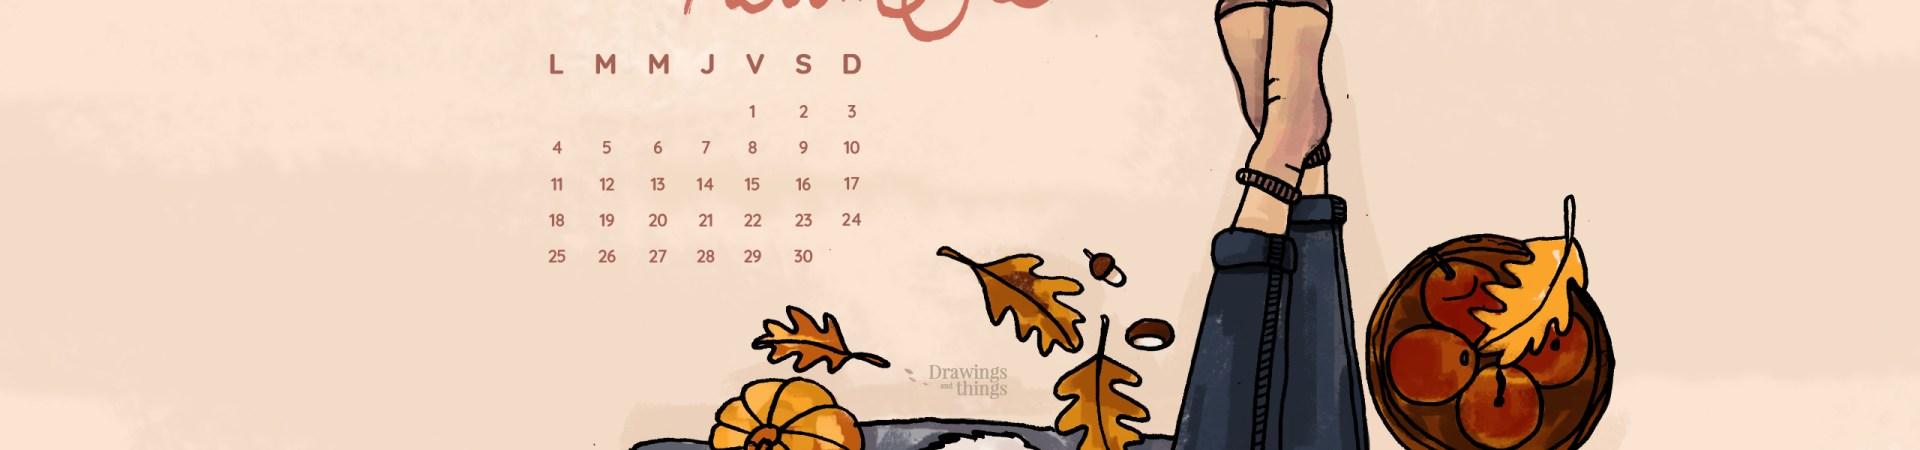 Wallpaper_Drawingsandthings_novembre-2019